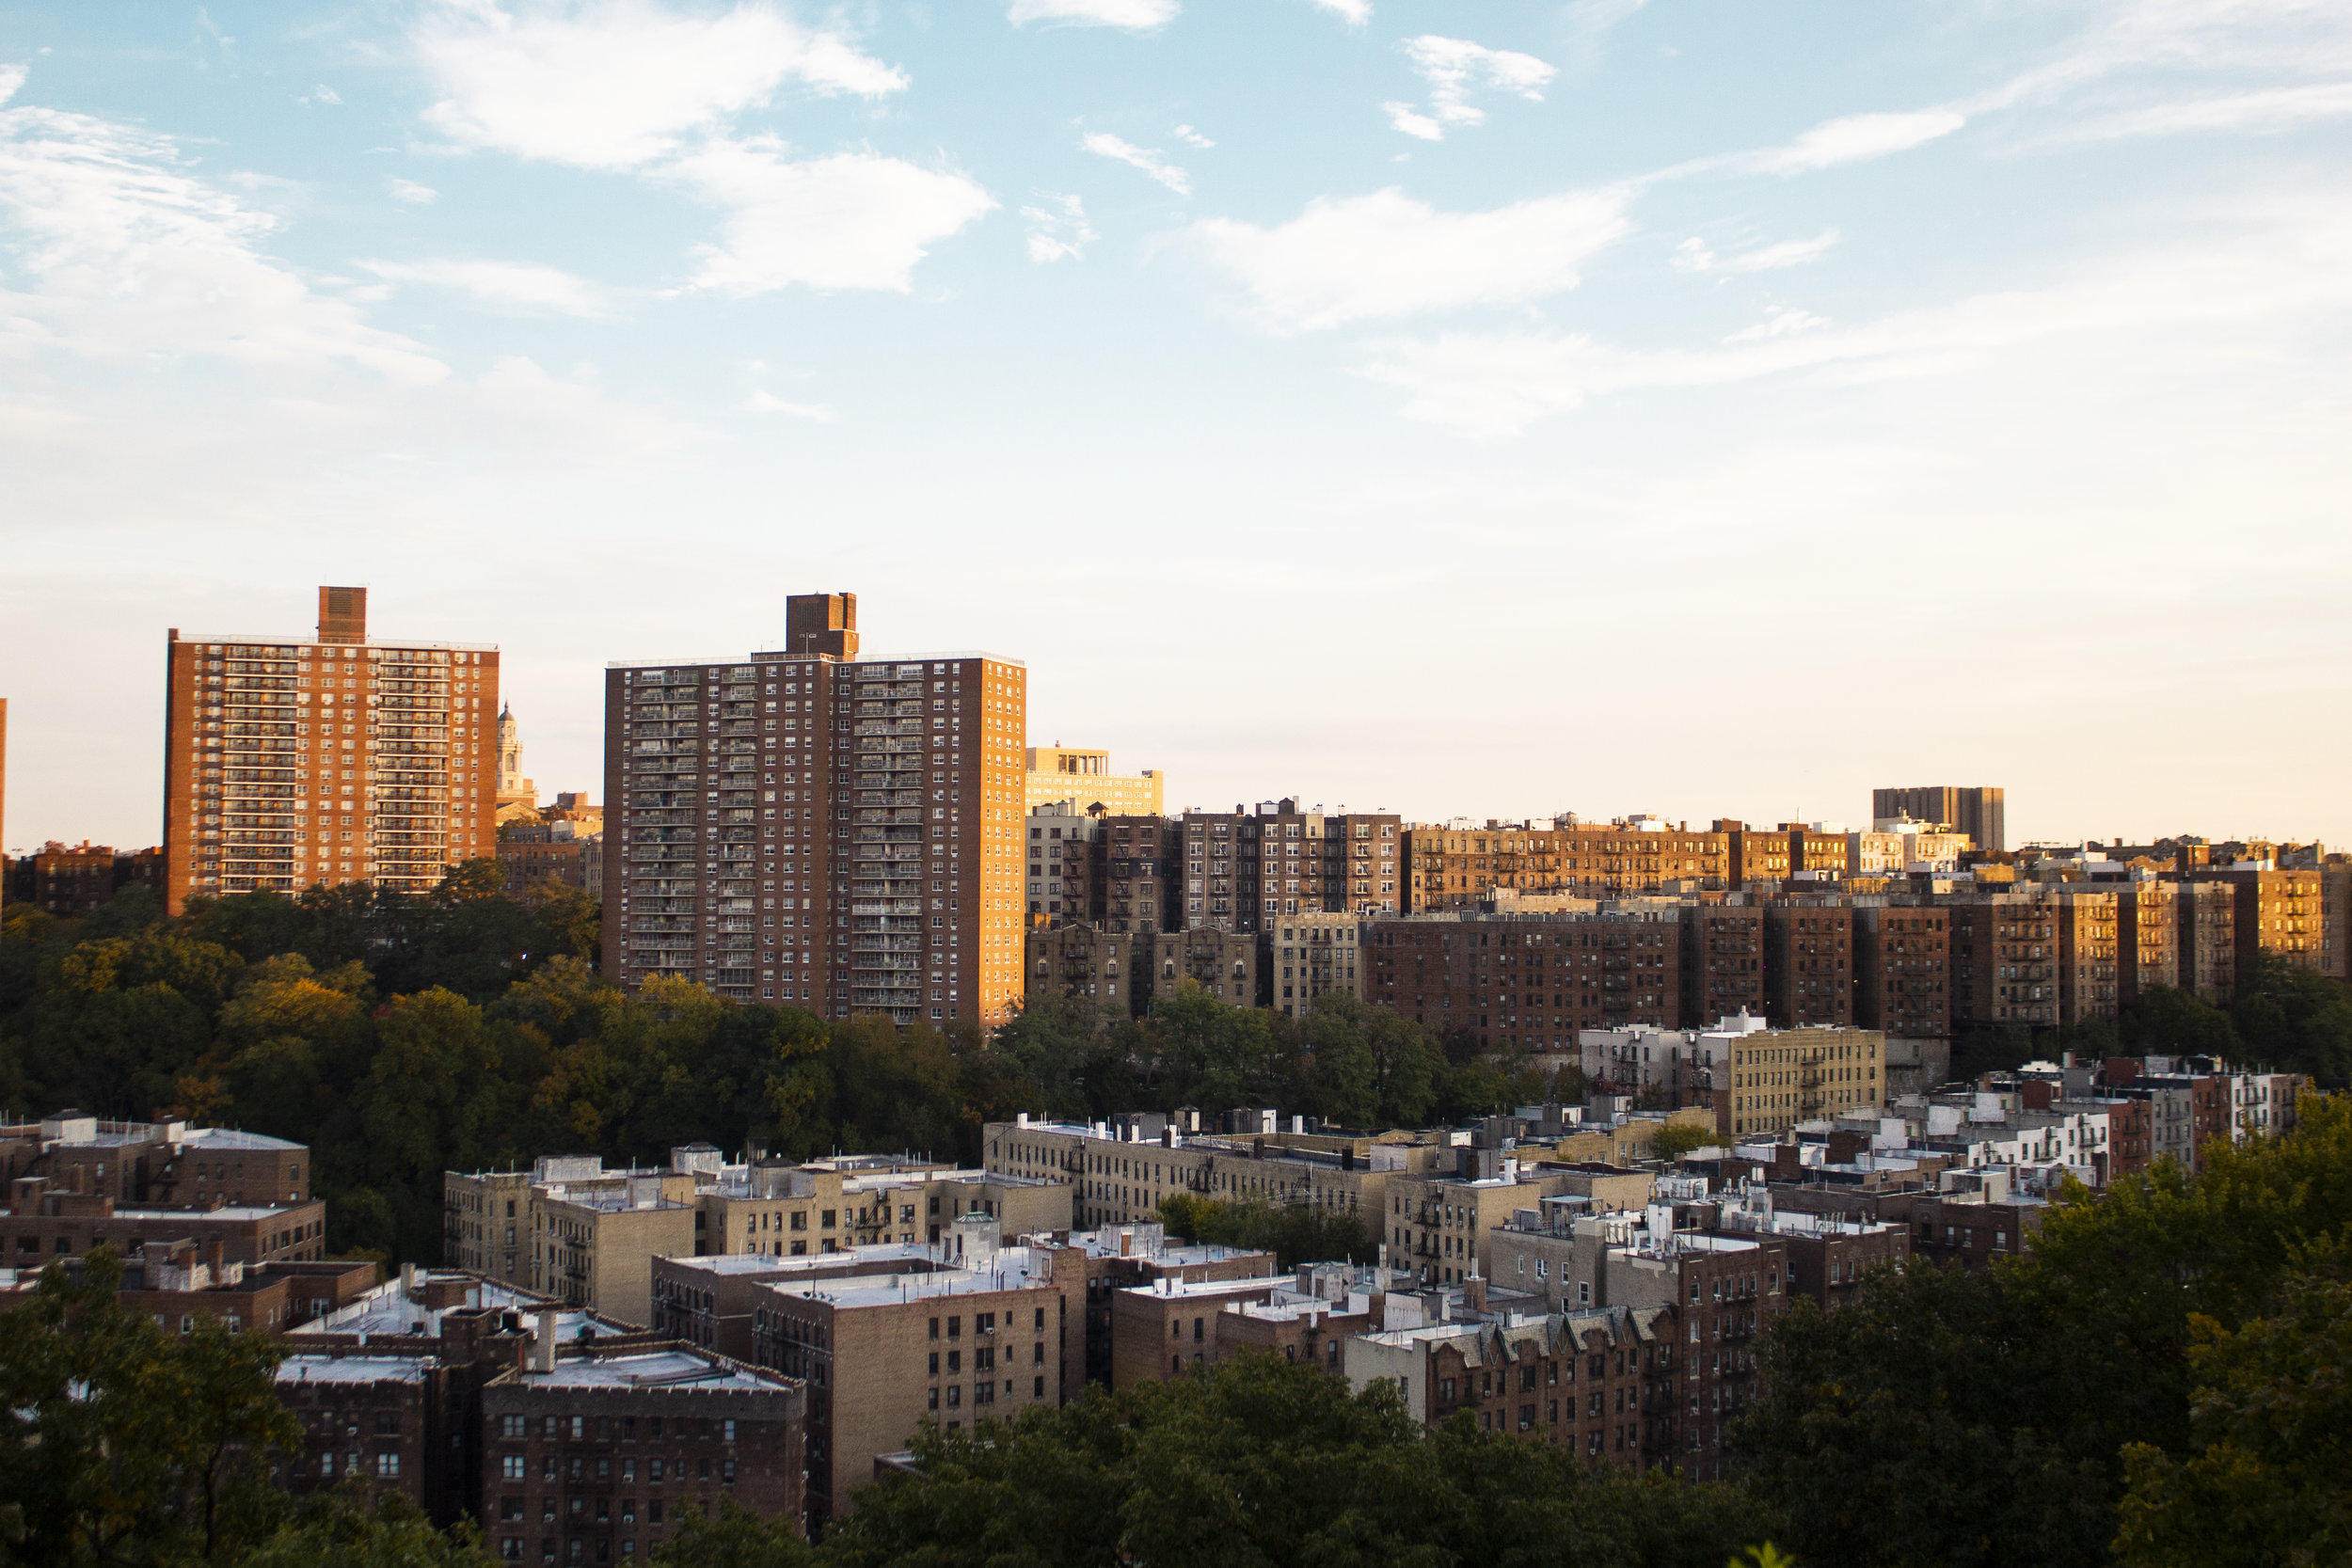 Upper Manhattan from Fort Tyron Park.    Photo credit to Bernadette Berdychowski.